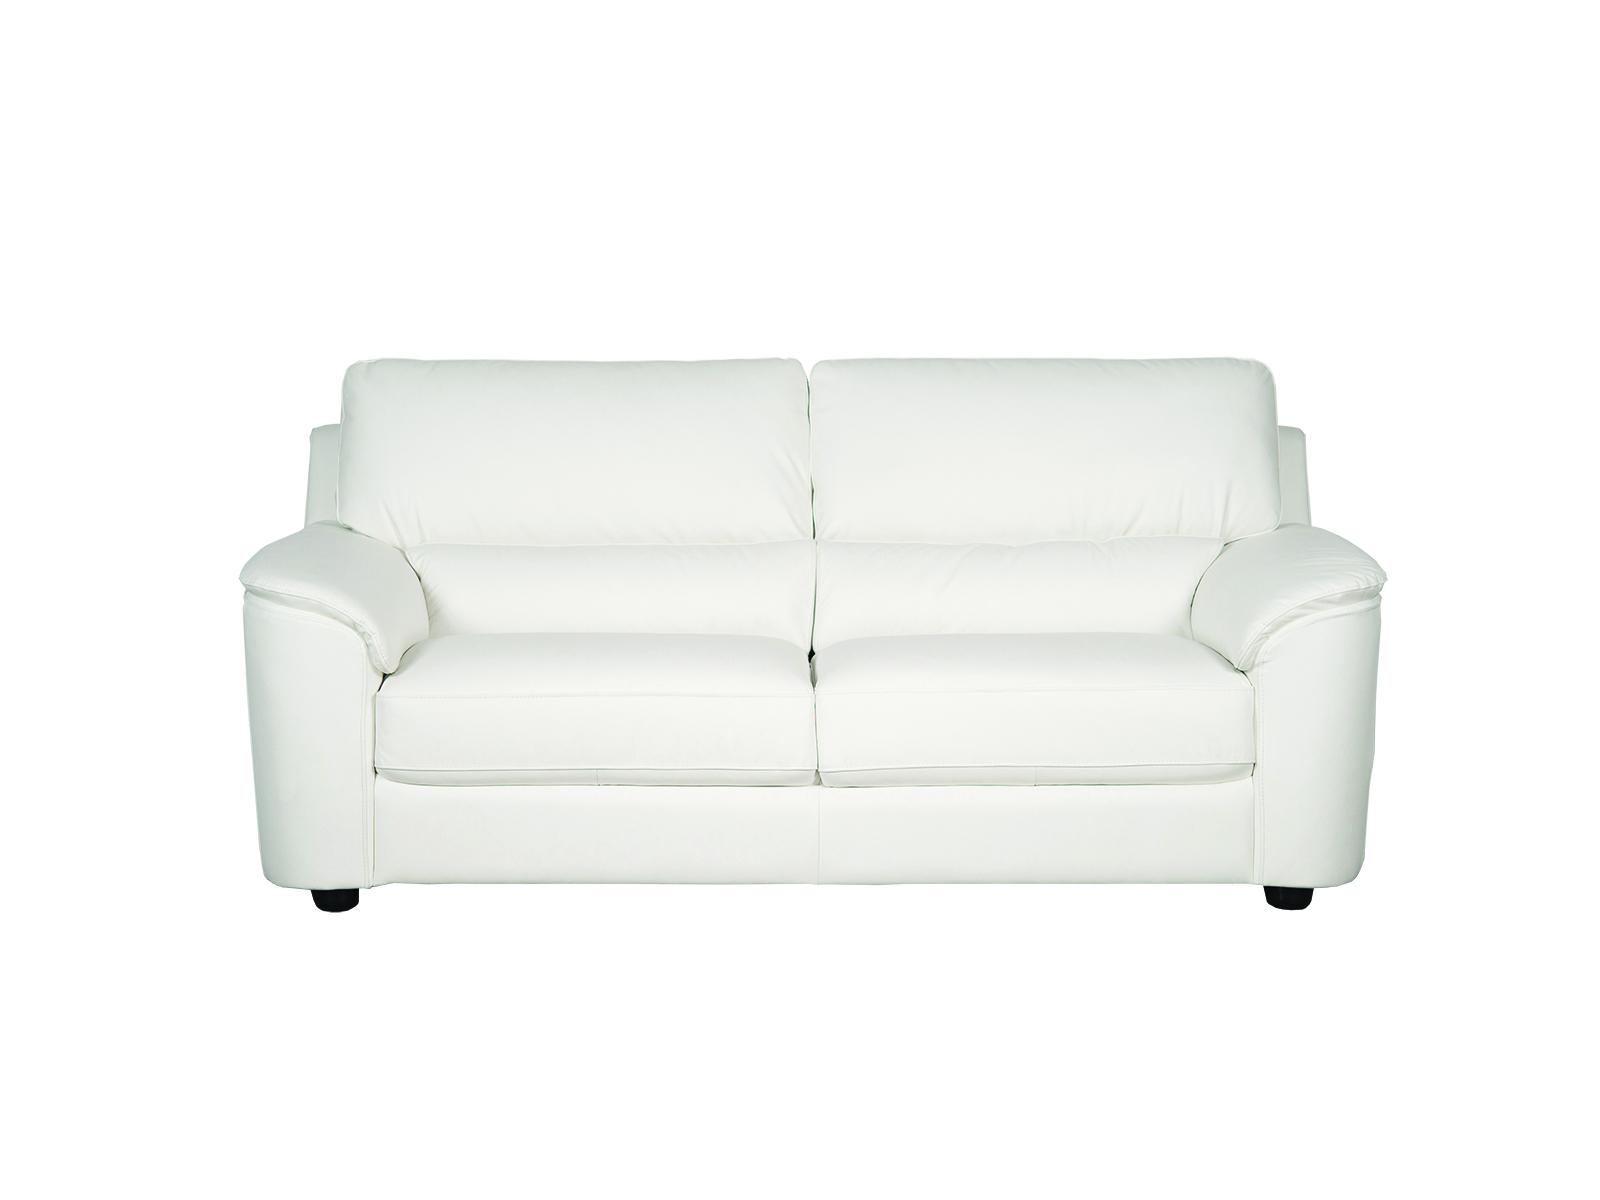 Canapea fixa 3 locuri Catrina White imagine